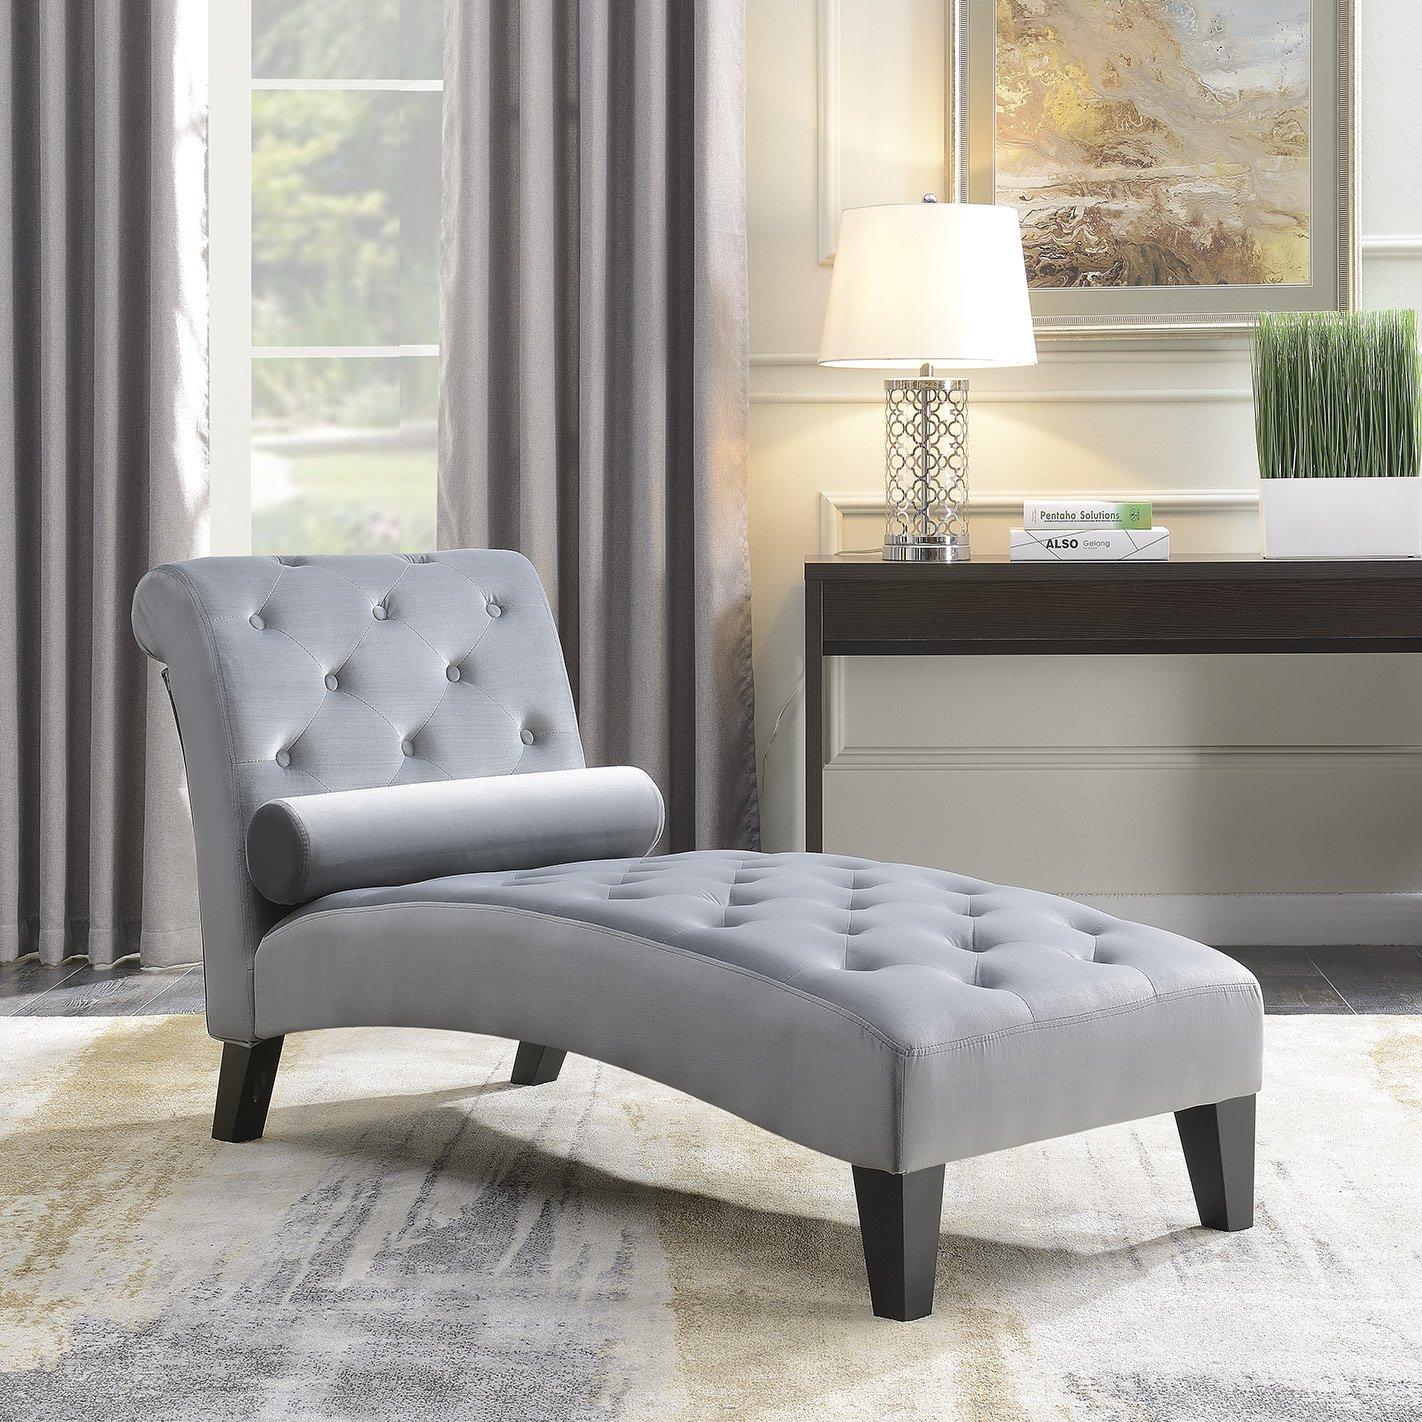 bedroom lounge chairs amazon com rh amazon com small lounge chair for bedroom lounge chair for master bedroom